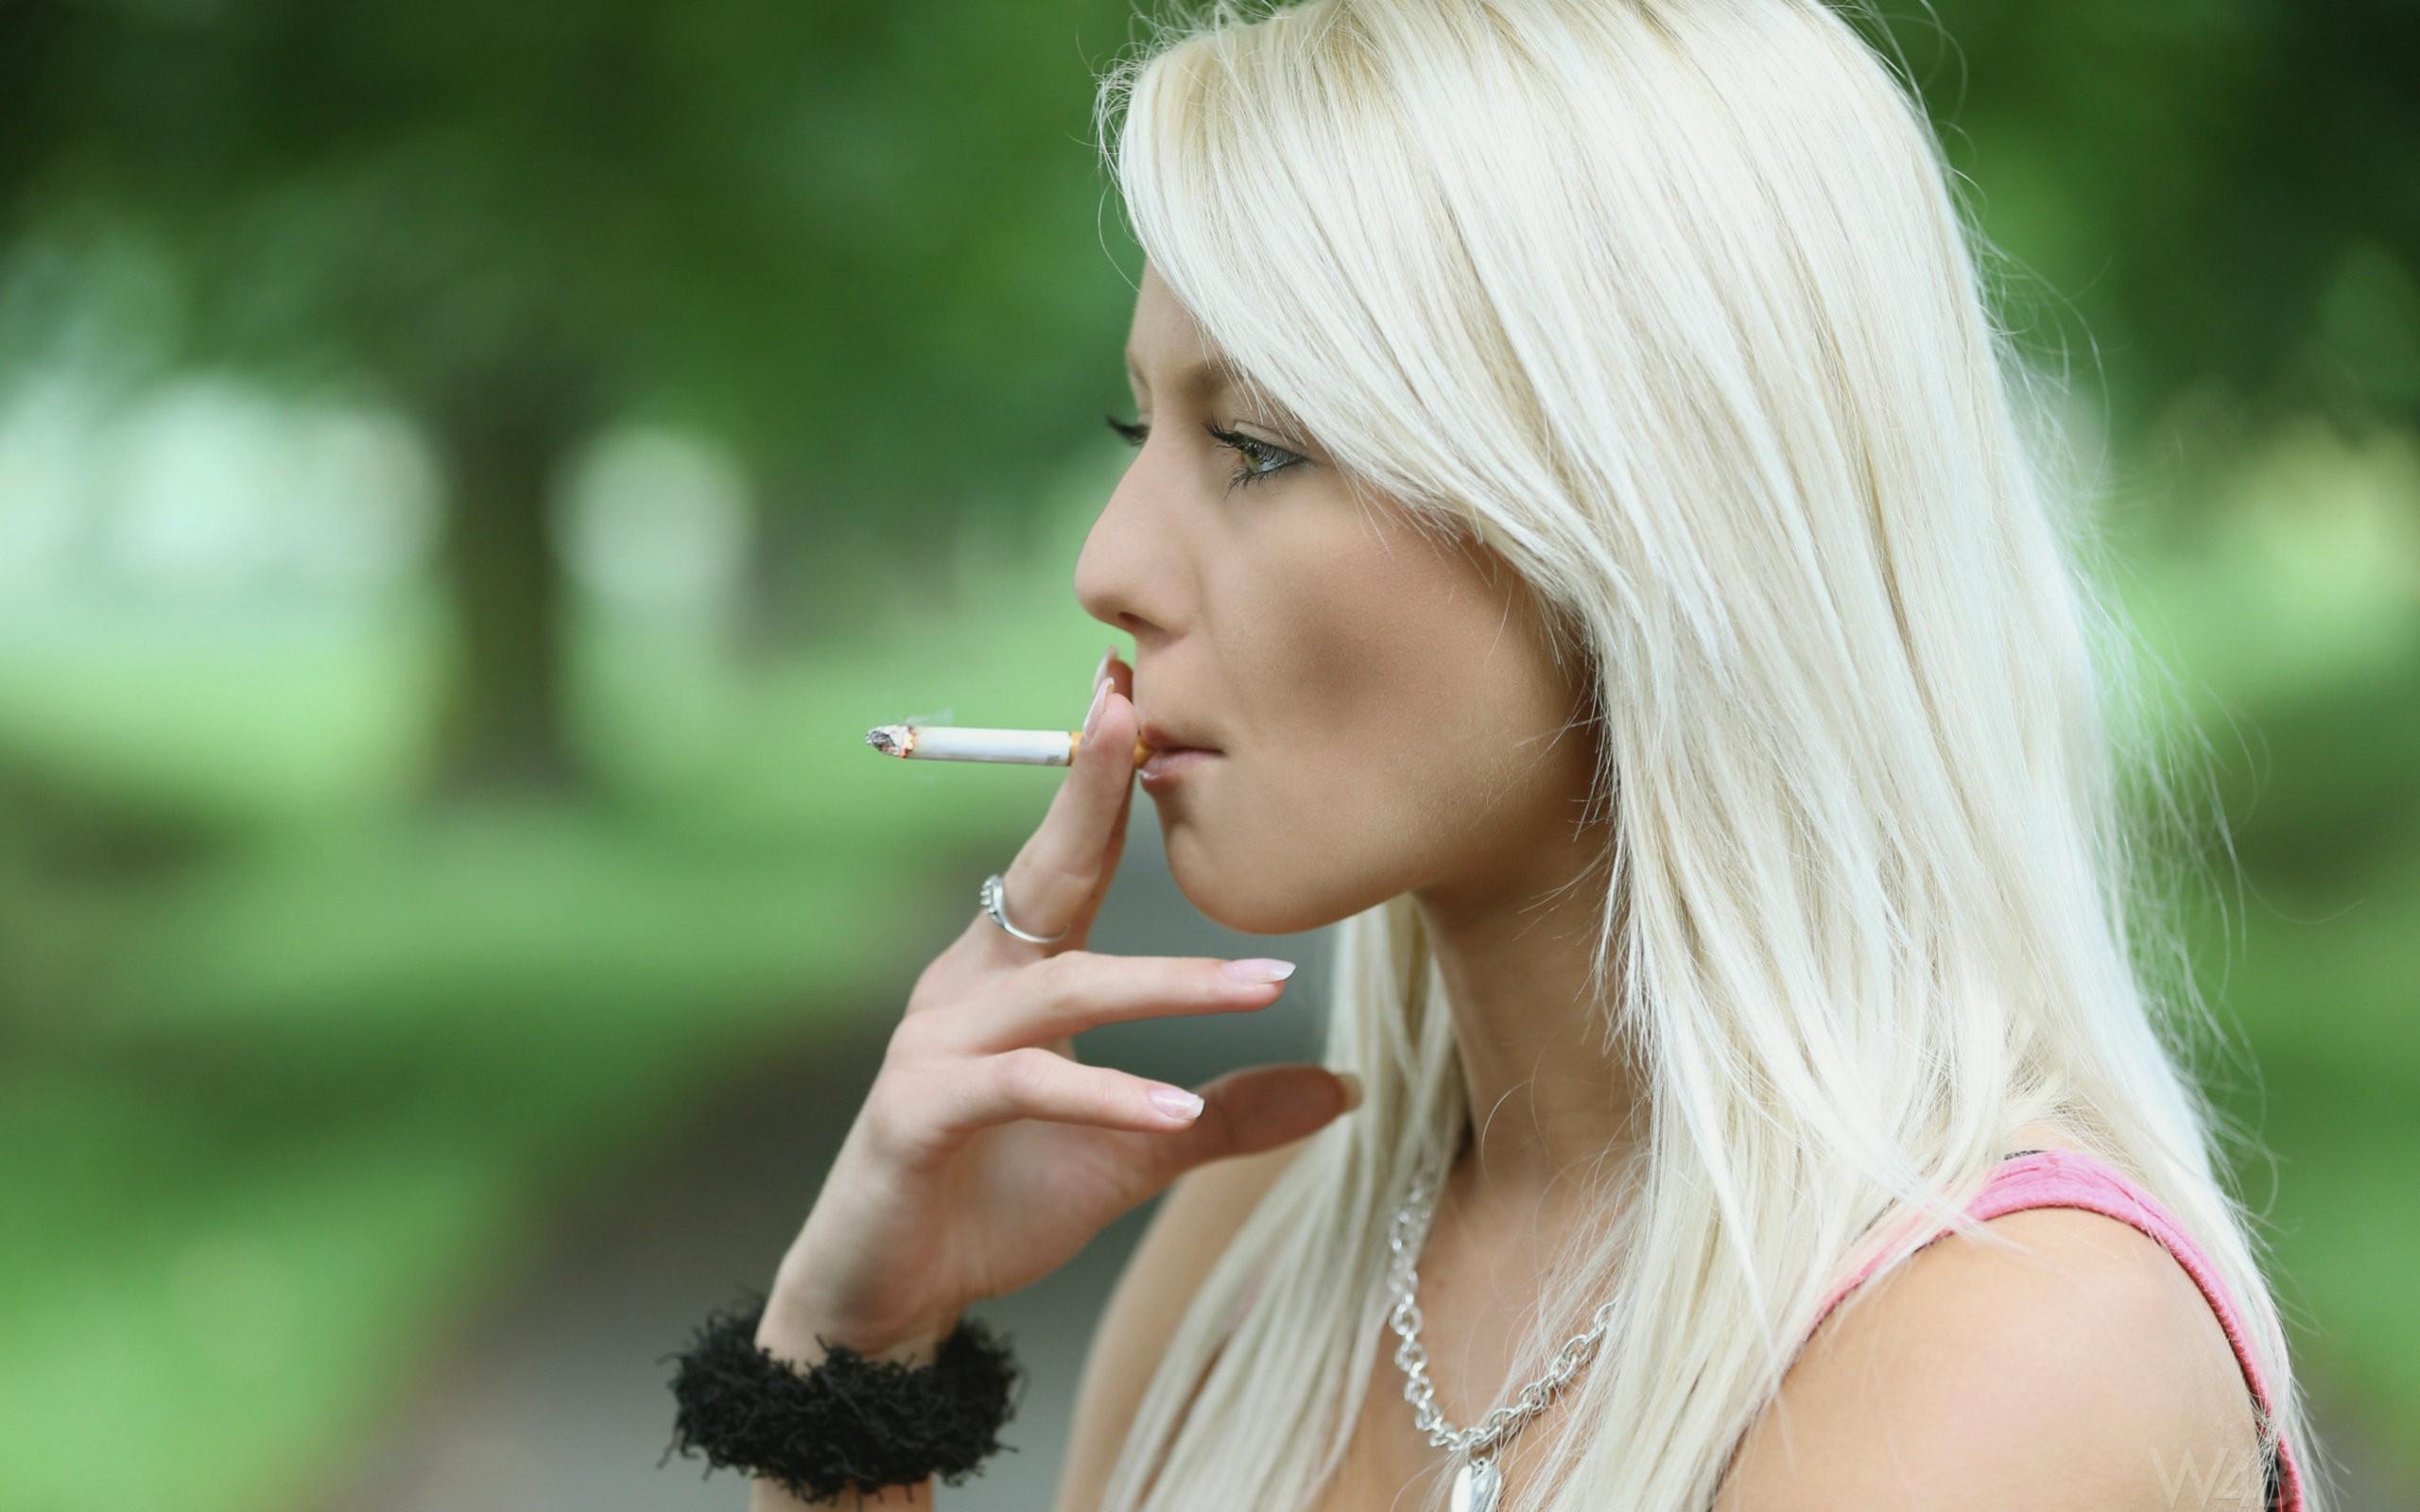 Chica rubia fumando - 2560x1600